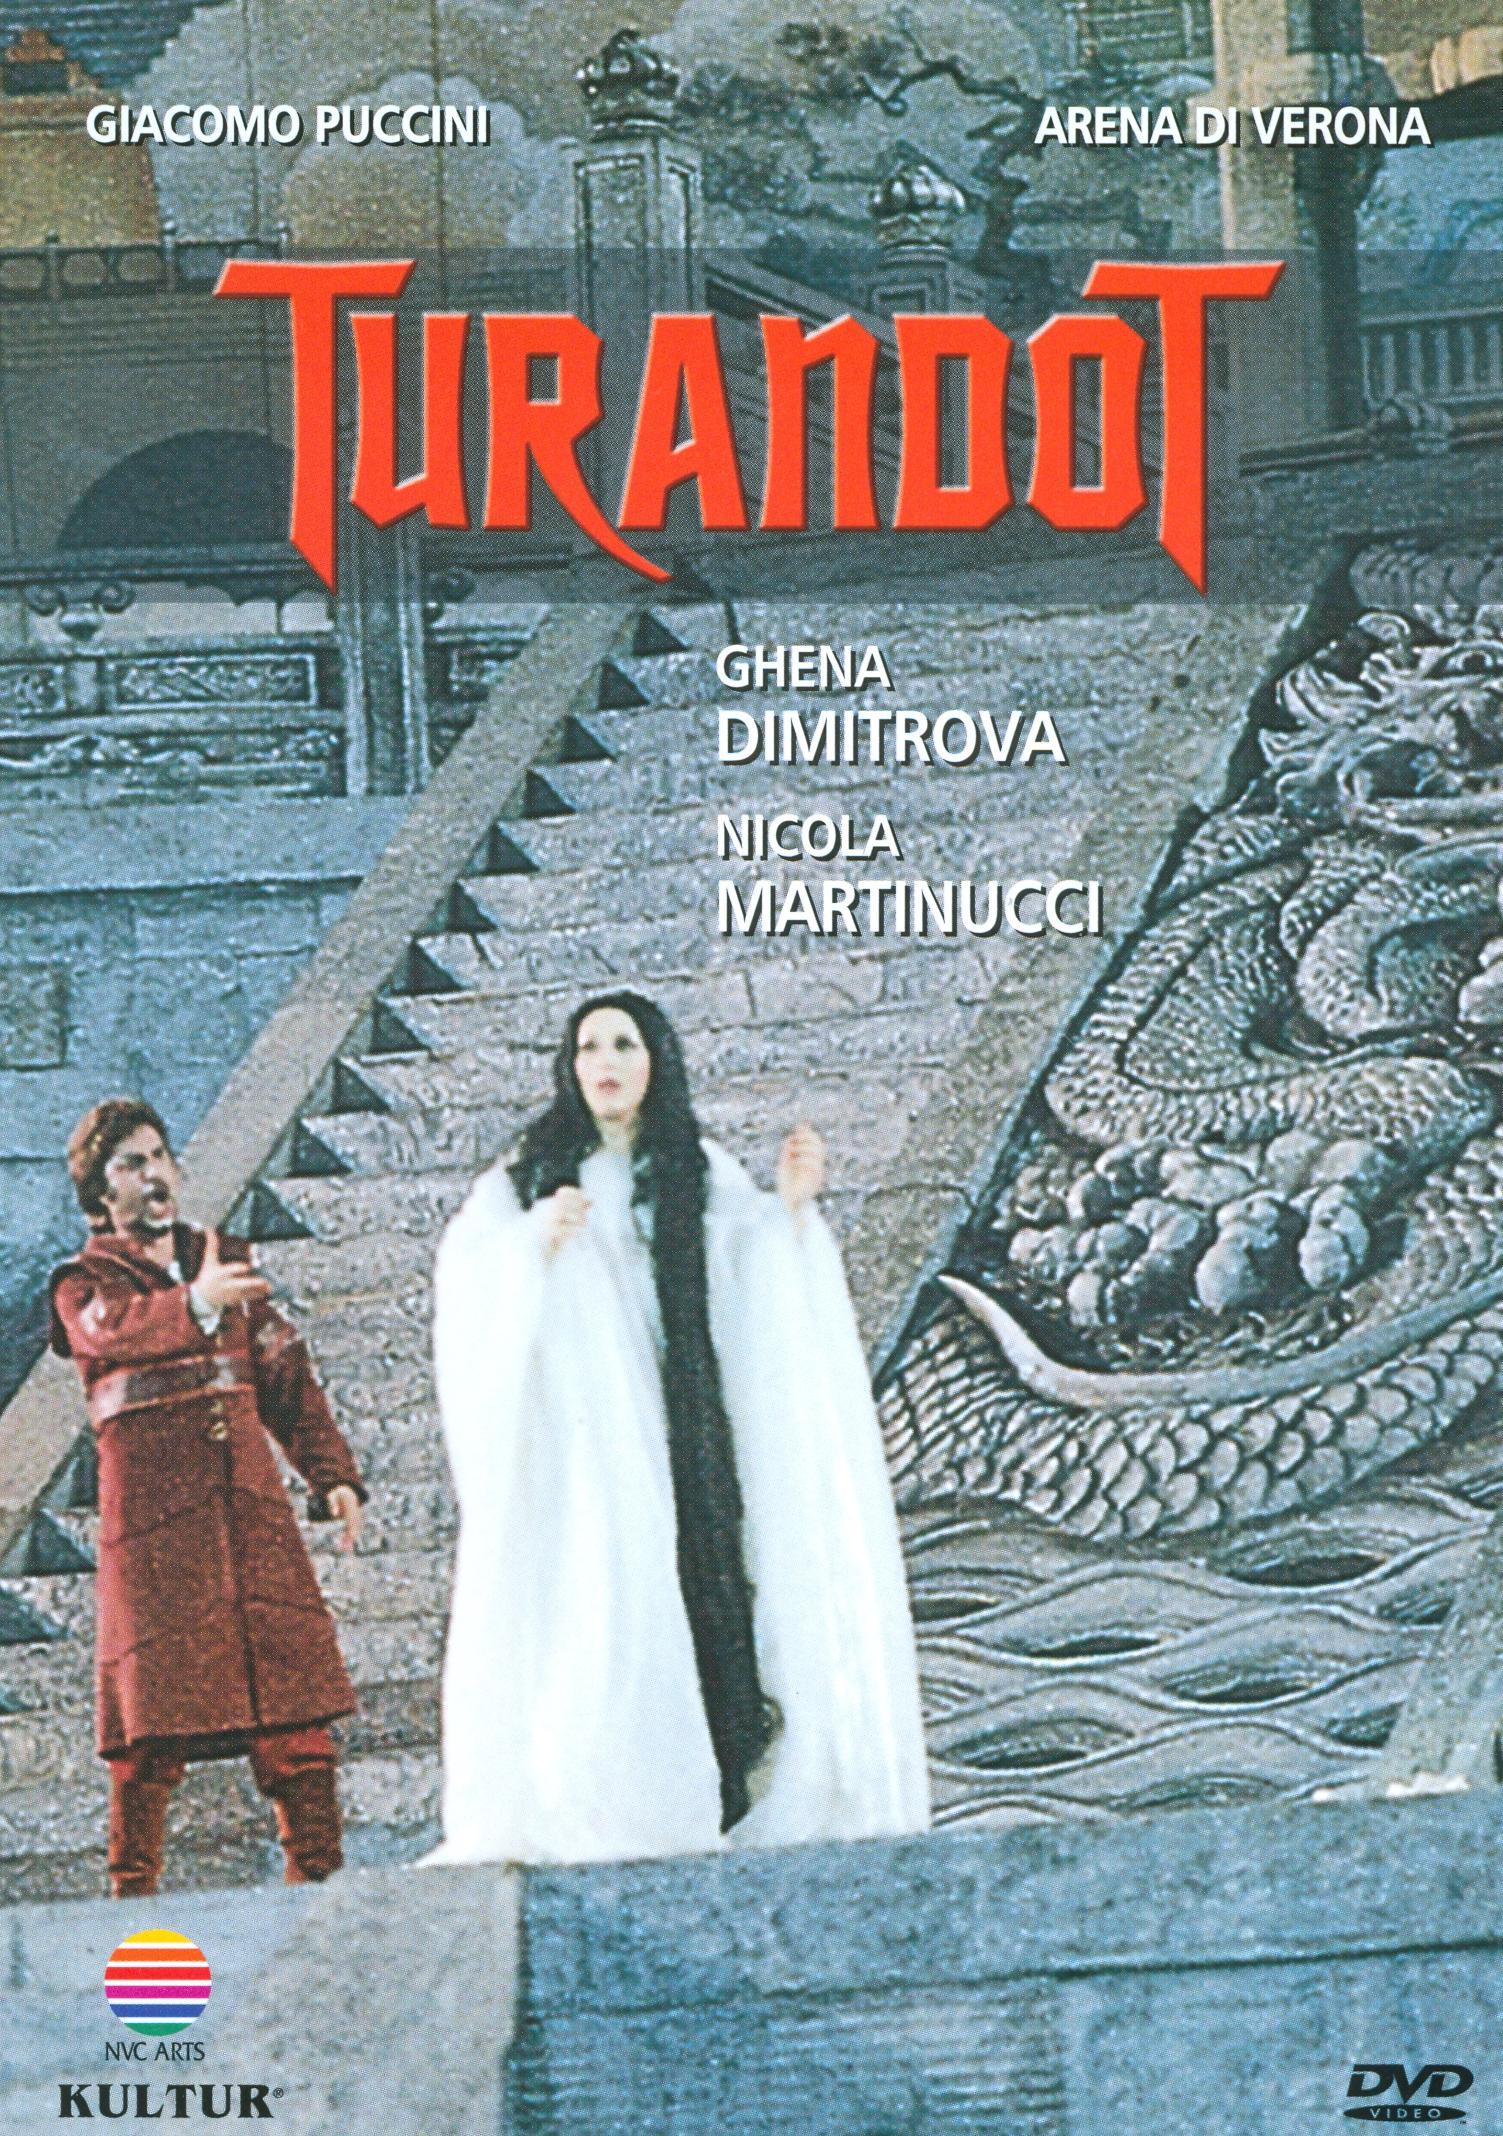 Turandot (Arena di Verona)